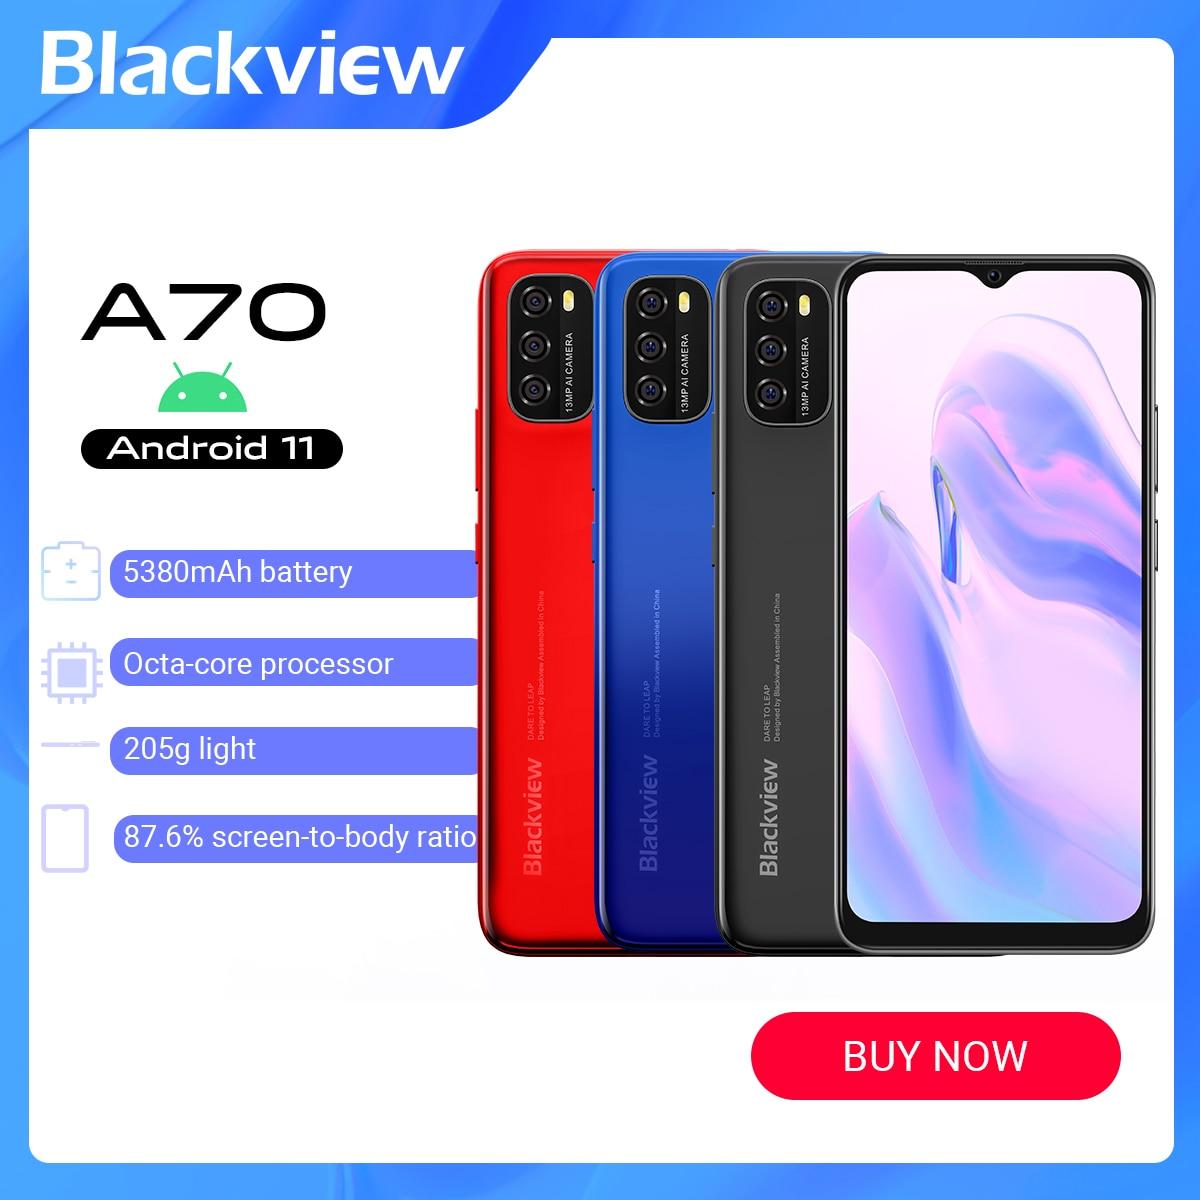 Blackview A70 Android 11 Smartphone Ram 3Gb Rom 32Gb Lte 4G 6.517Inch Smartphone Octa Core Vingerafdruk unlocked Mobiele Gps